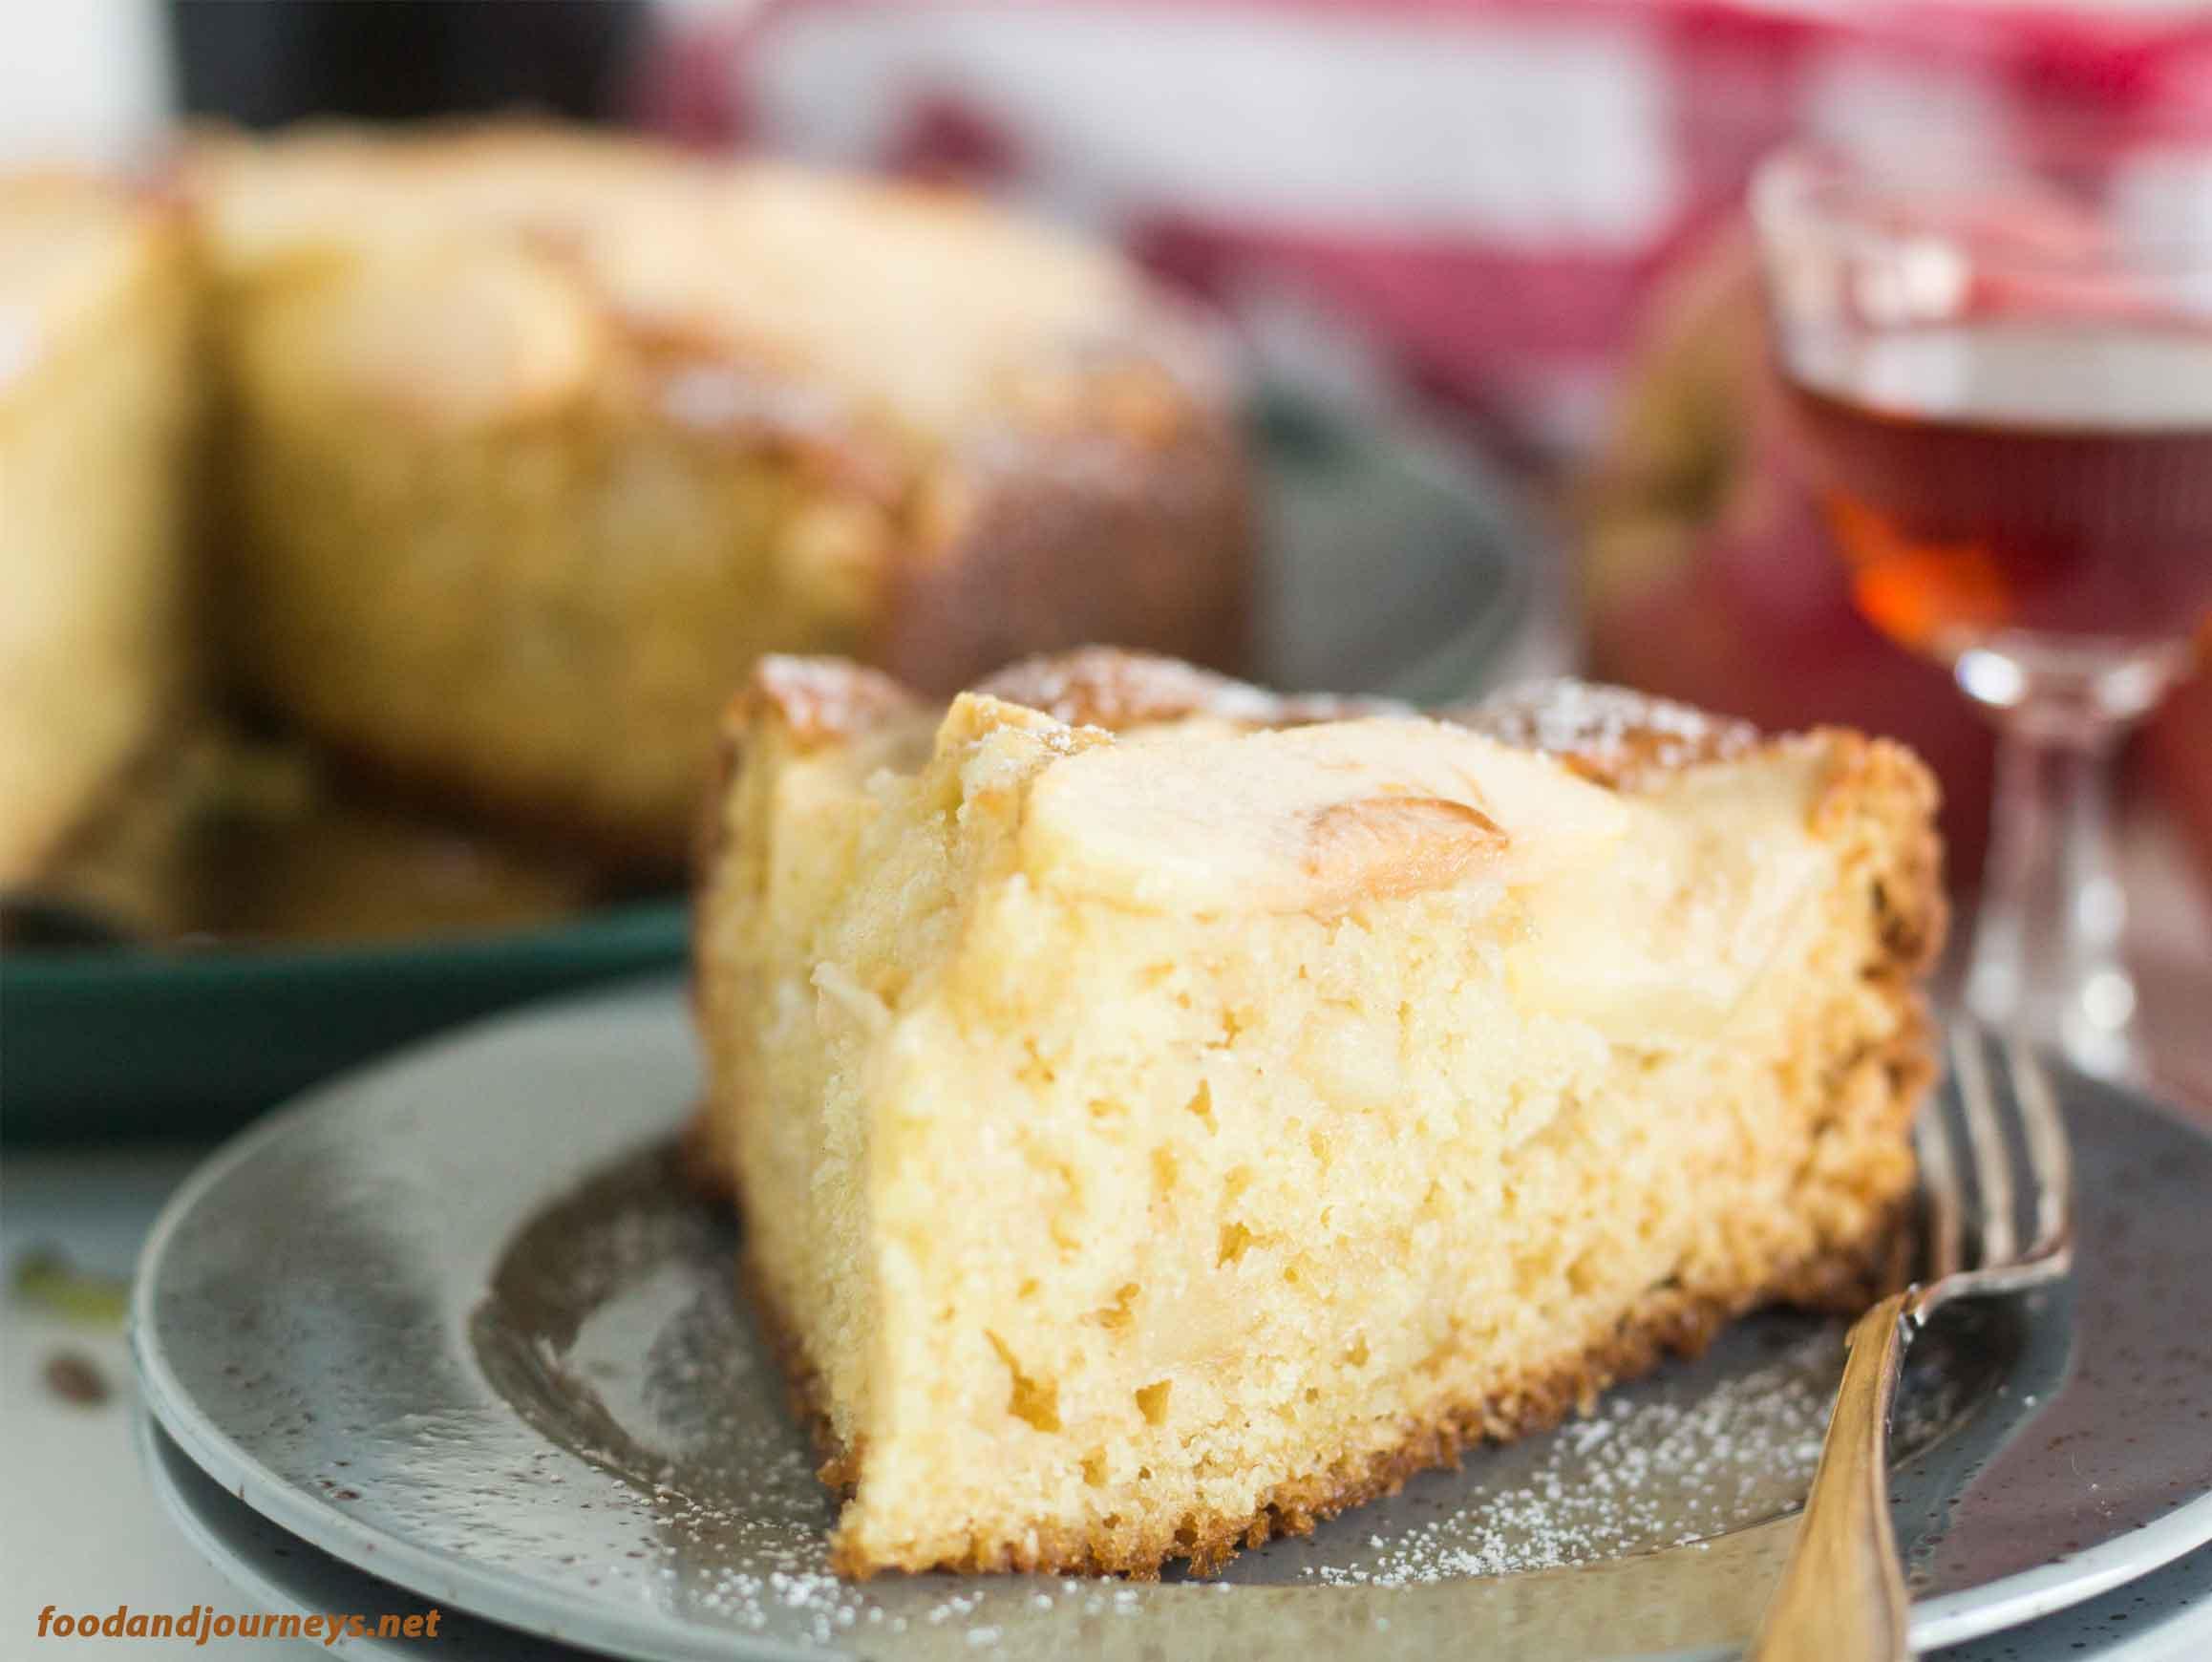 Tuscan Apple Cake PIC2|foodandjourneys.net